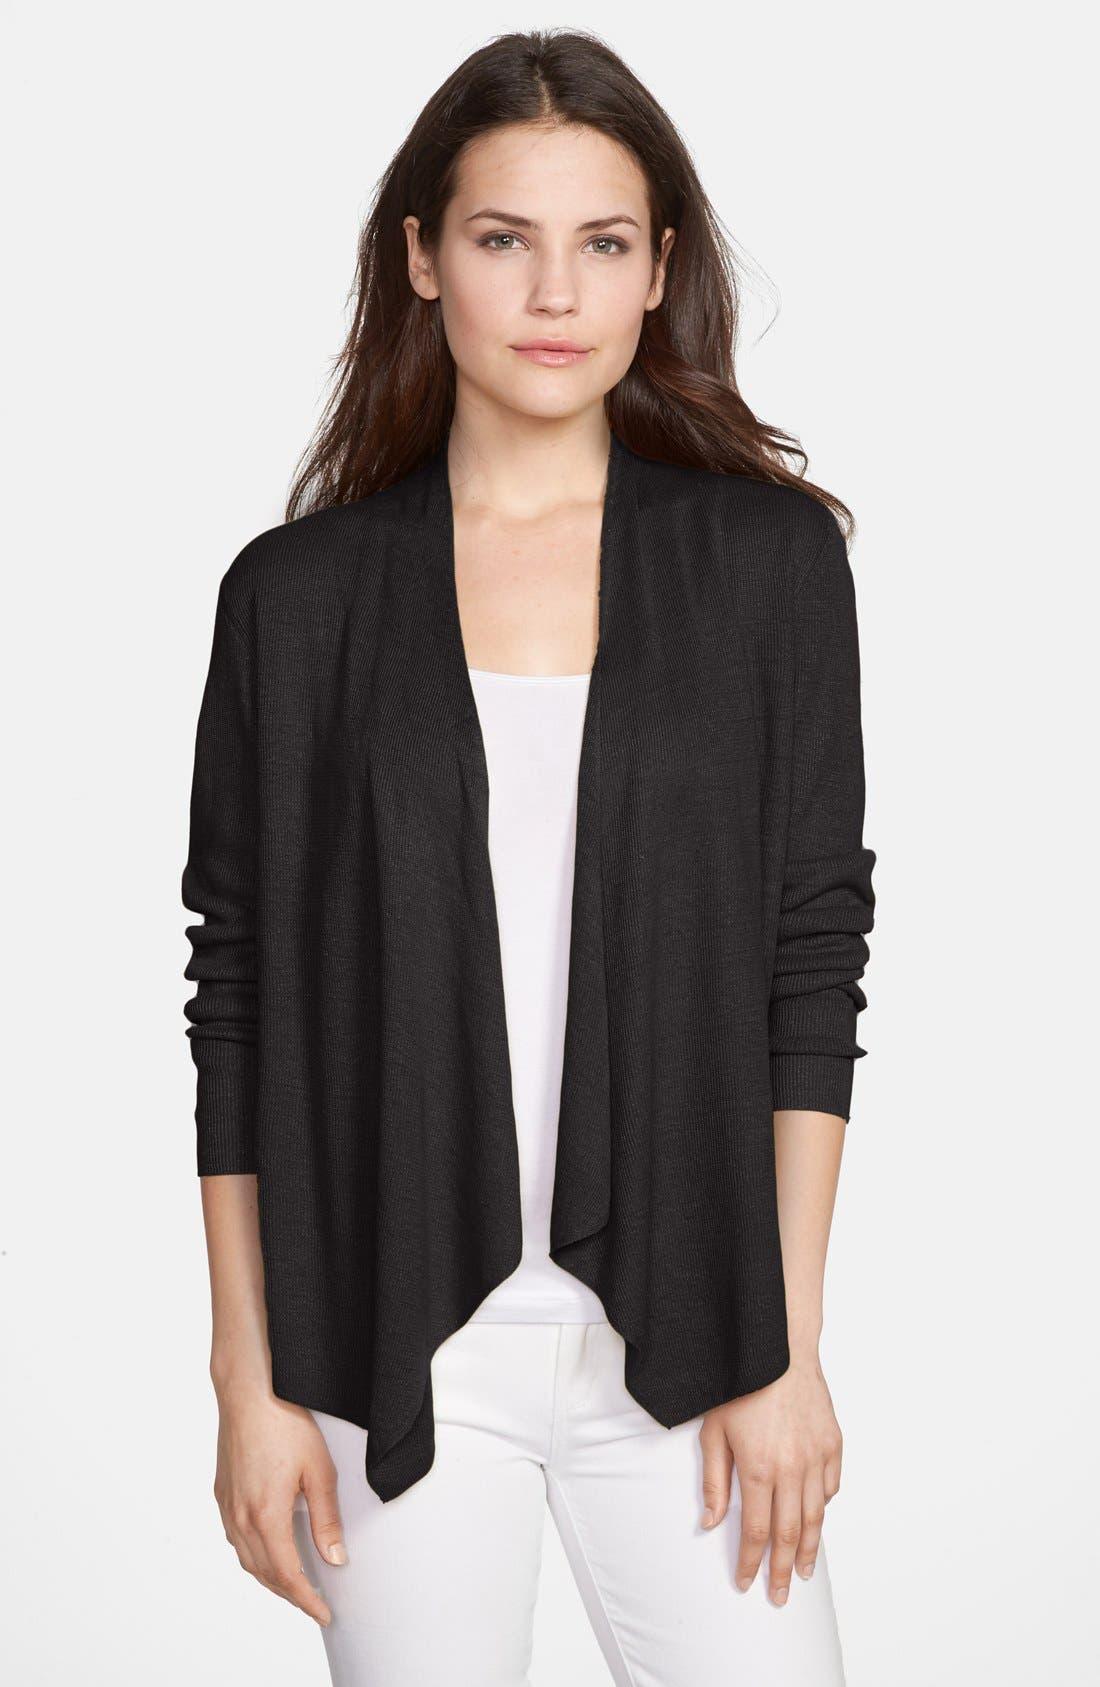 Alternate Image 1 Selected - Eileen Fisher Organic Linen Angle Front Cardigan (Regular & Petite)